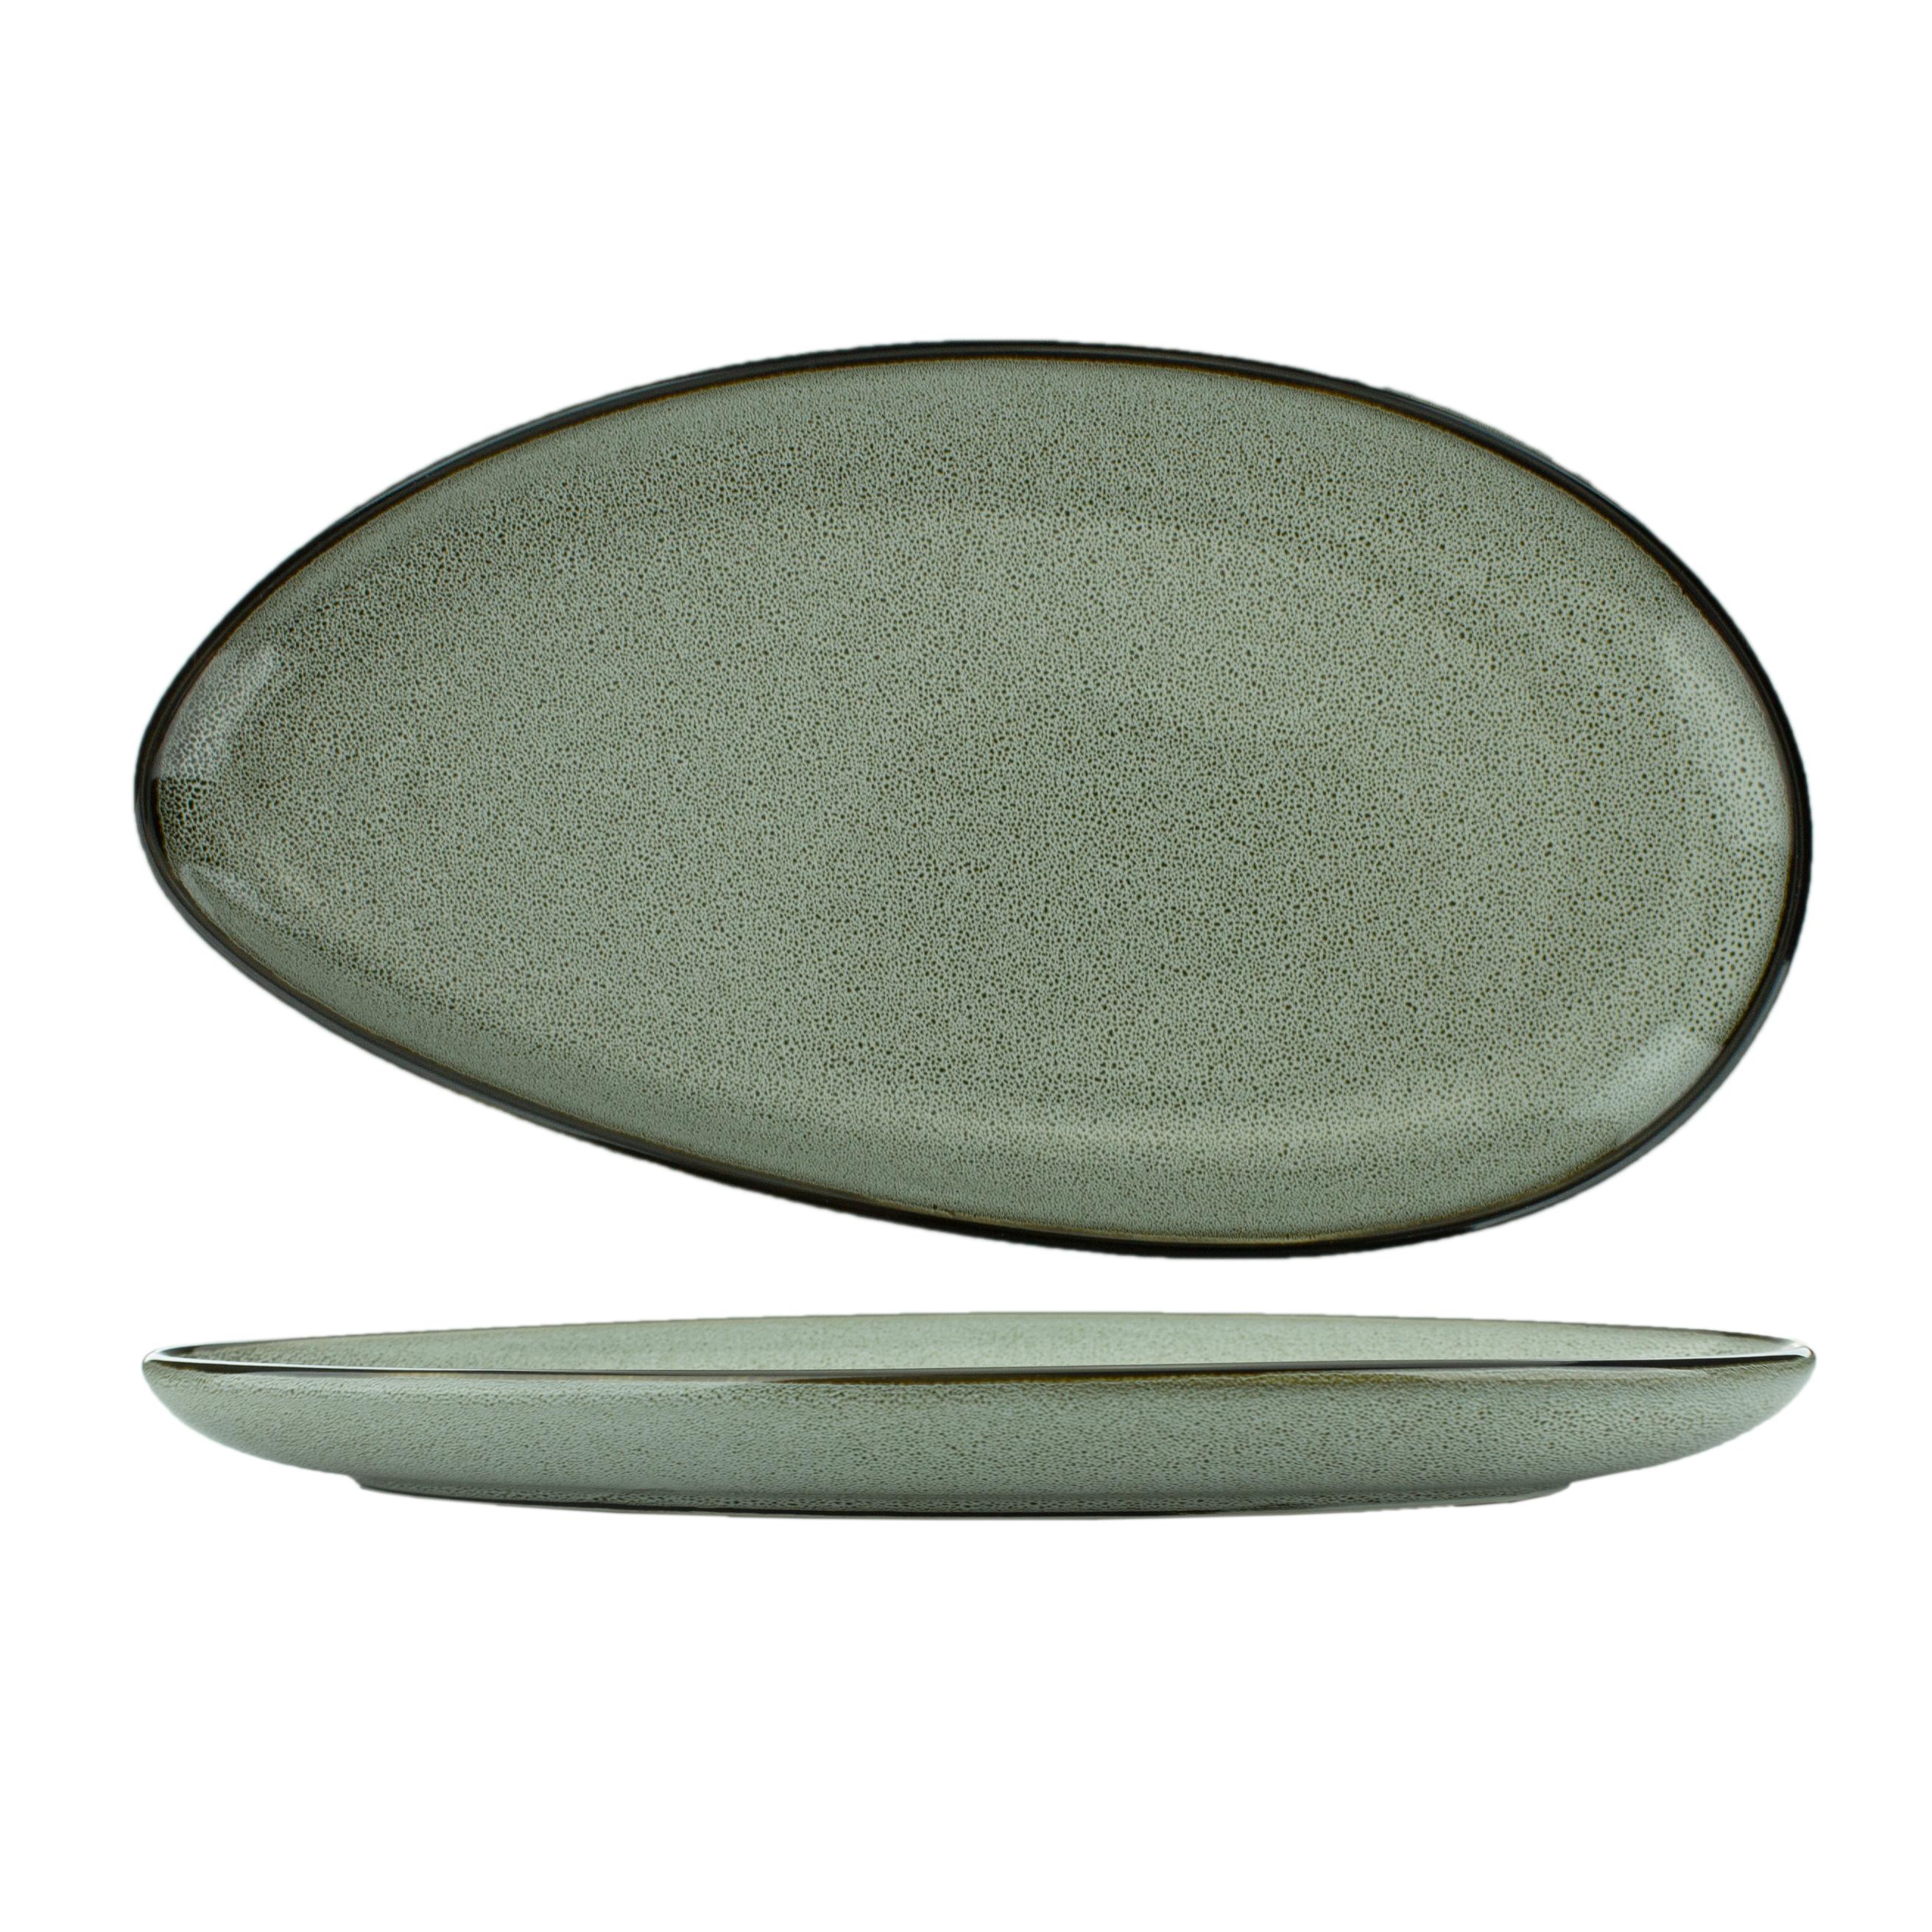 International Tableware LU-12-AS platter, china